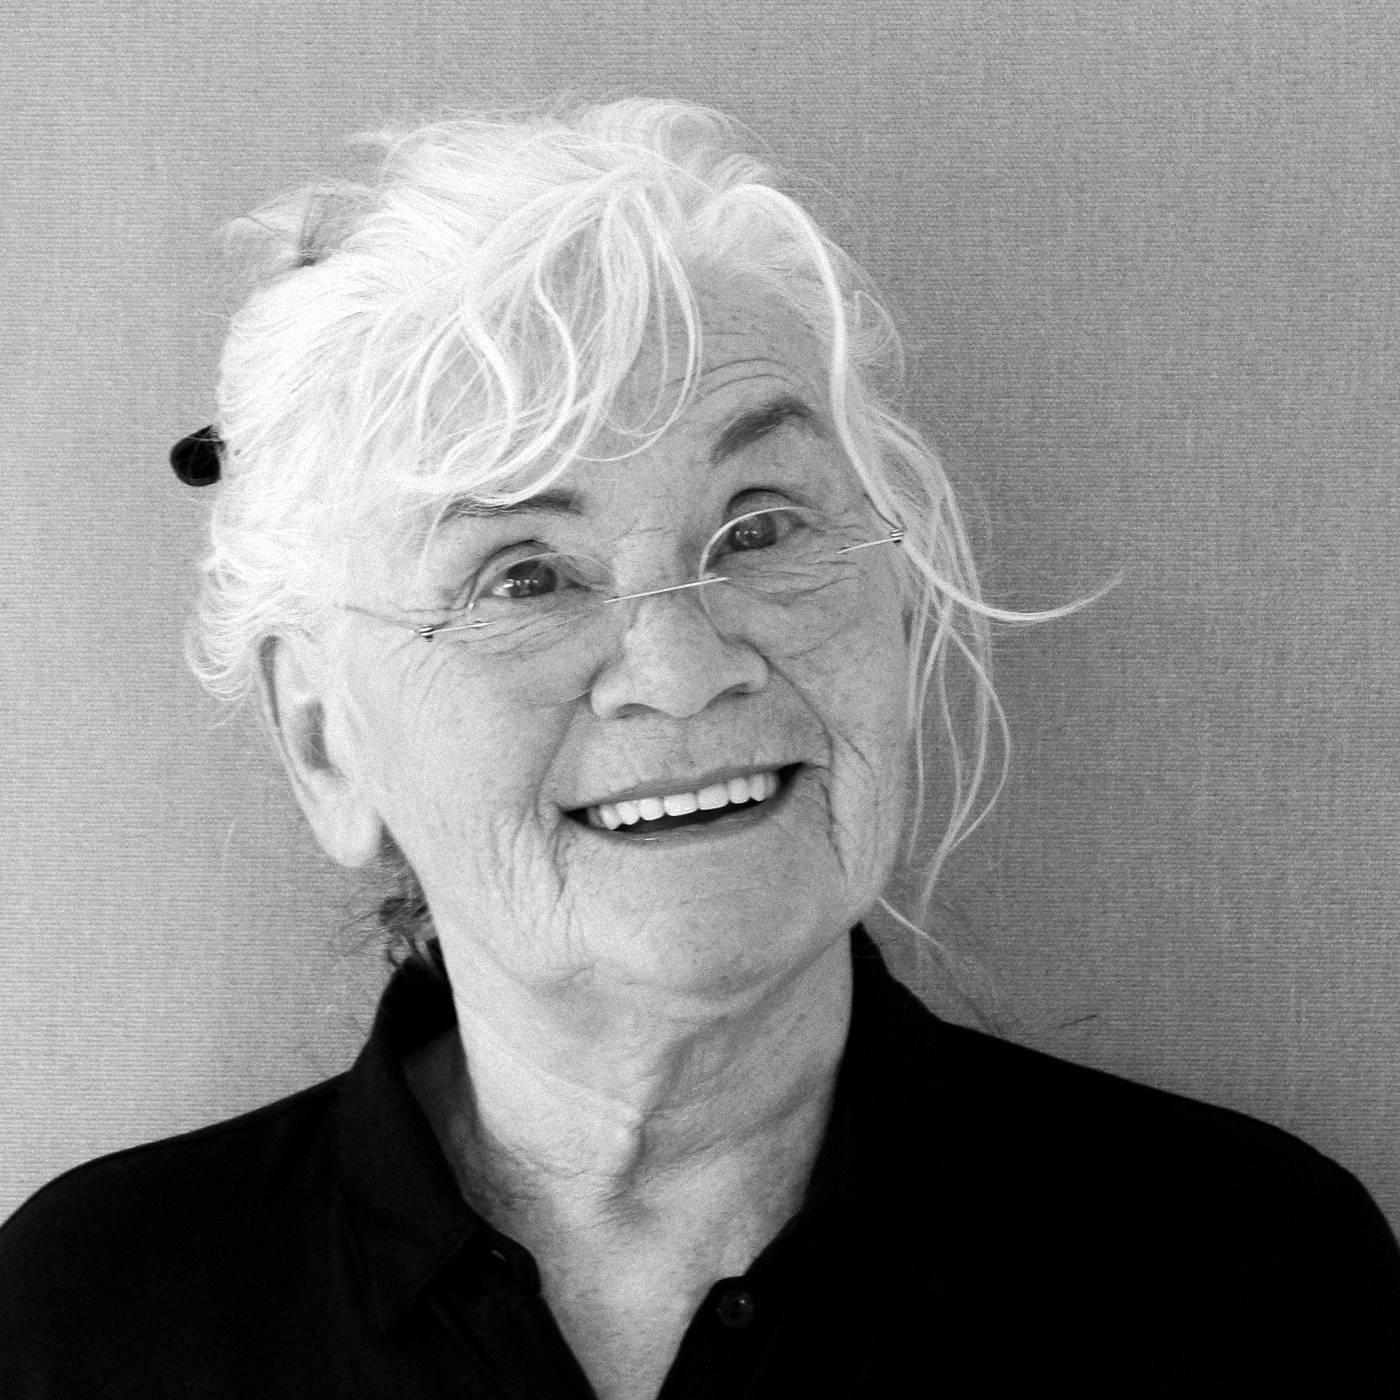 Künstlerin und Moderatorin Etelka Kovacs-Koller